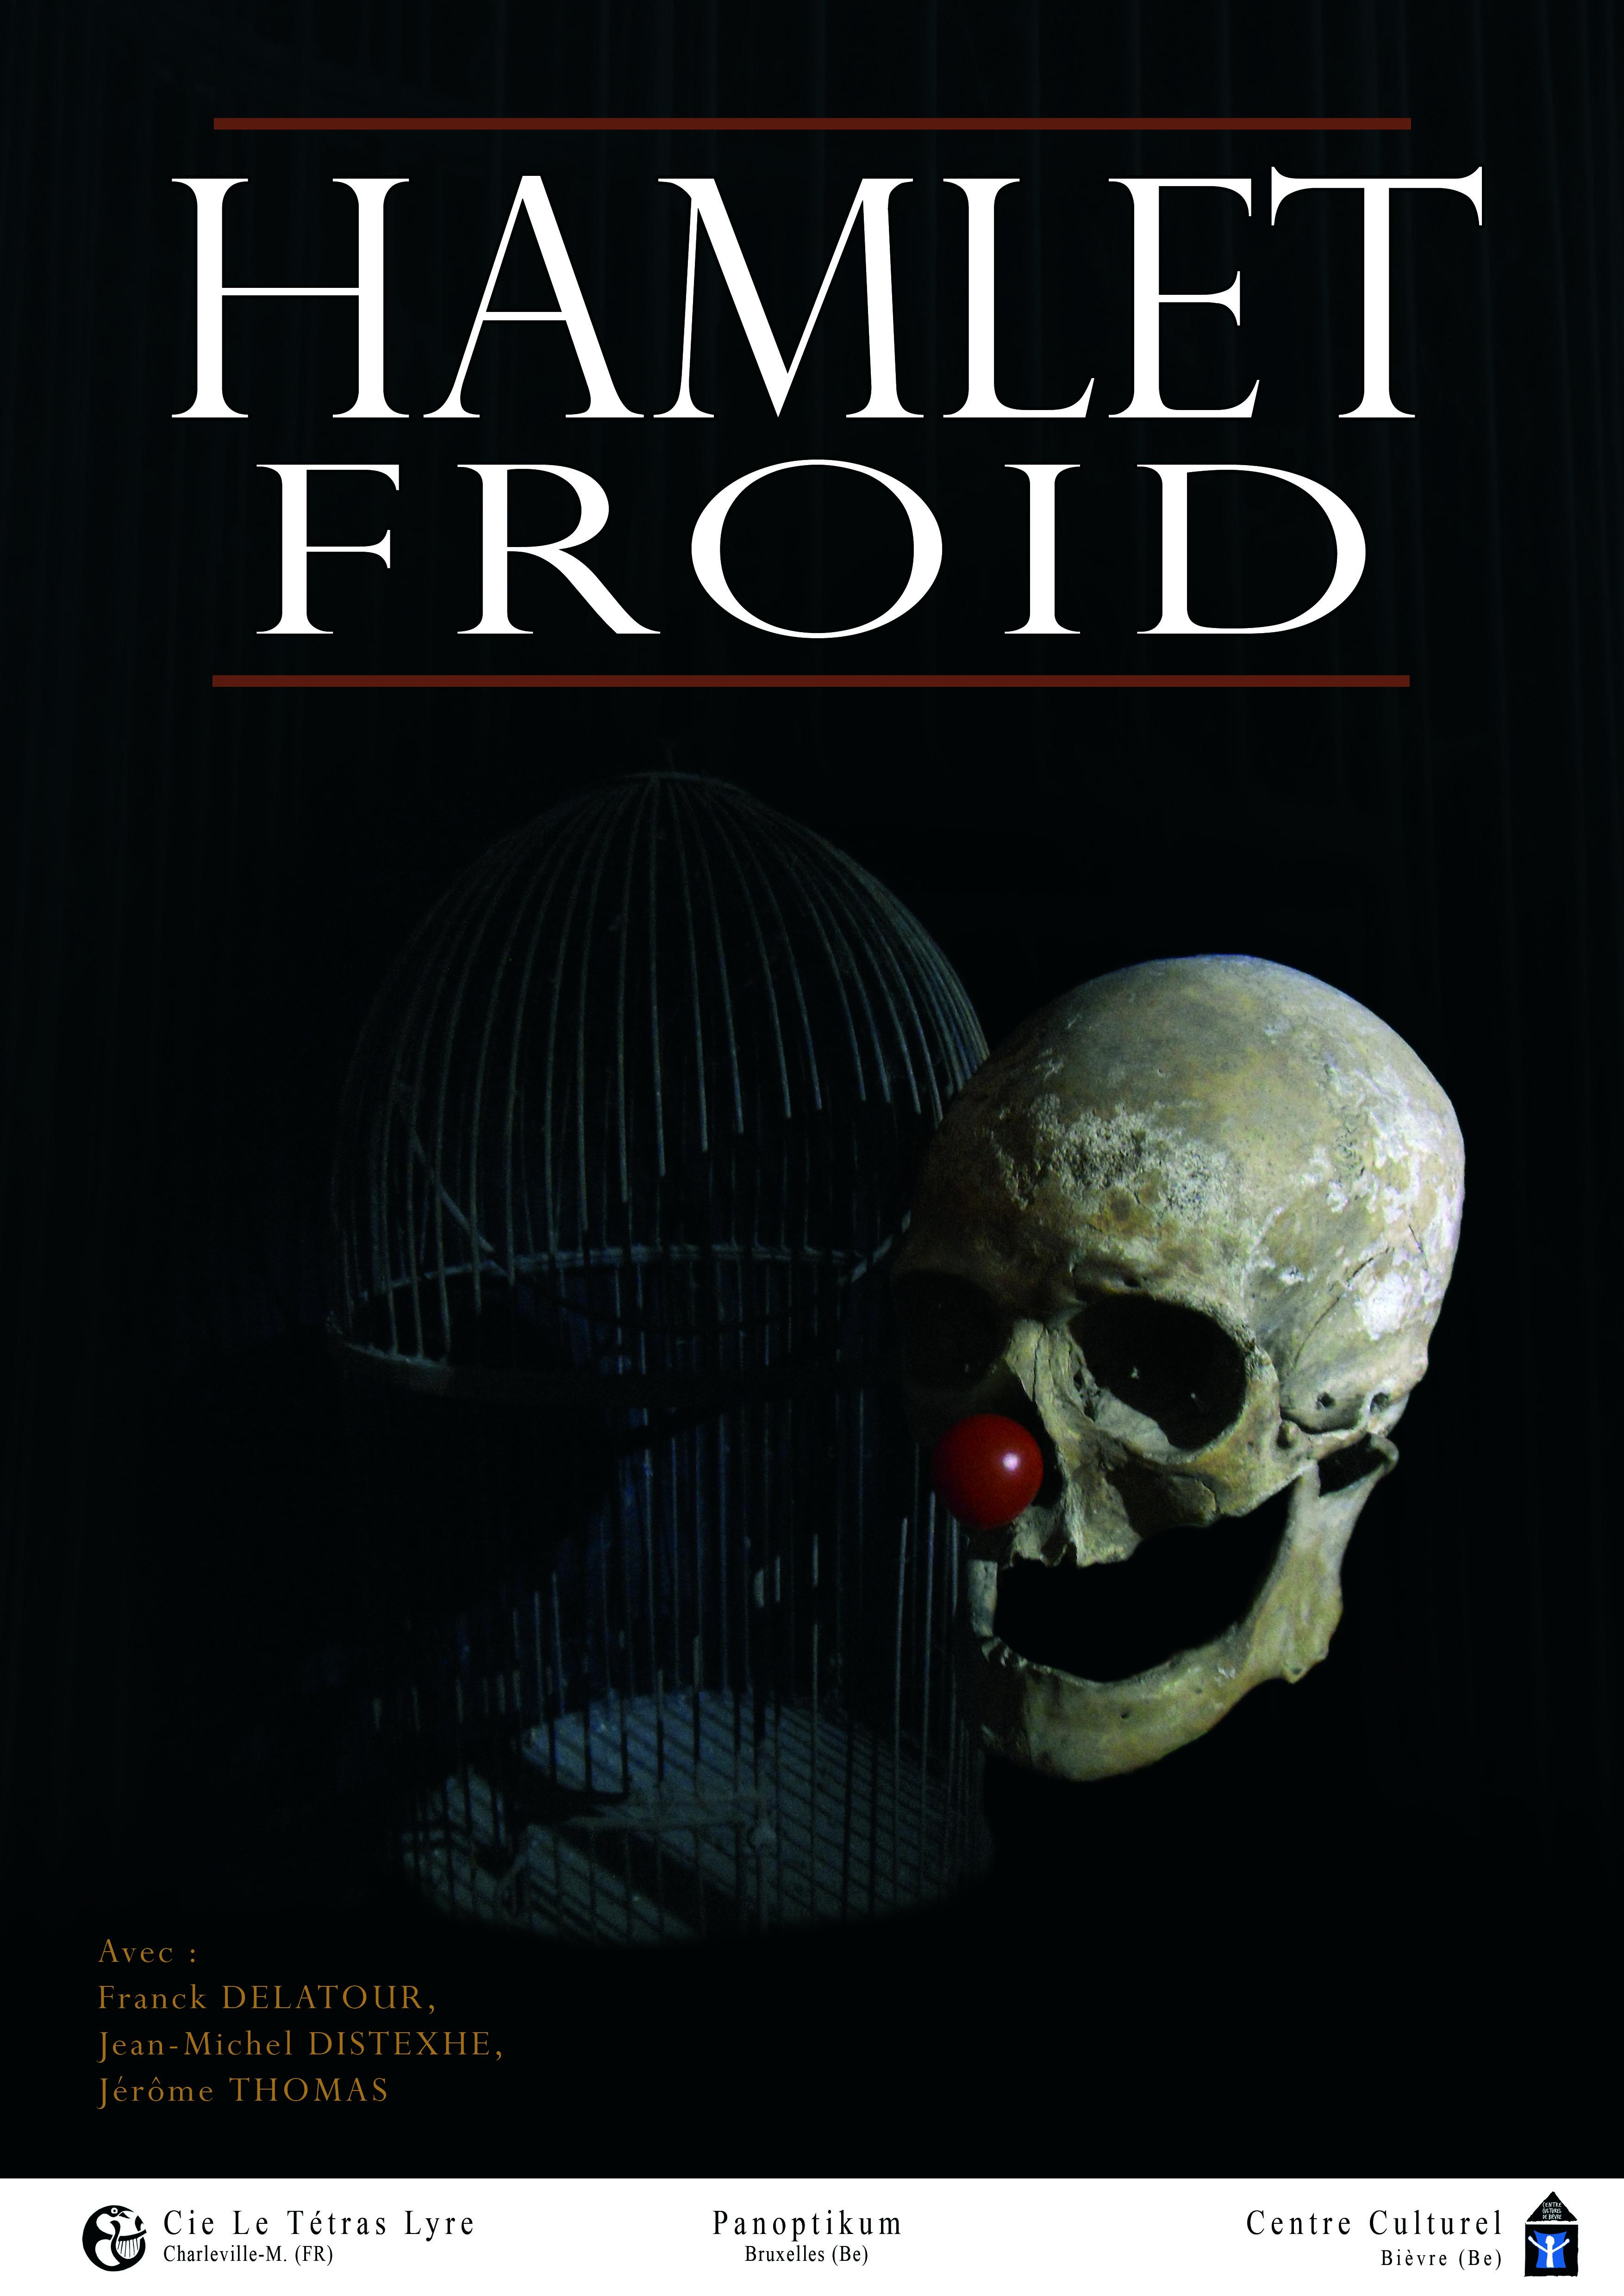 Hamlet Froid